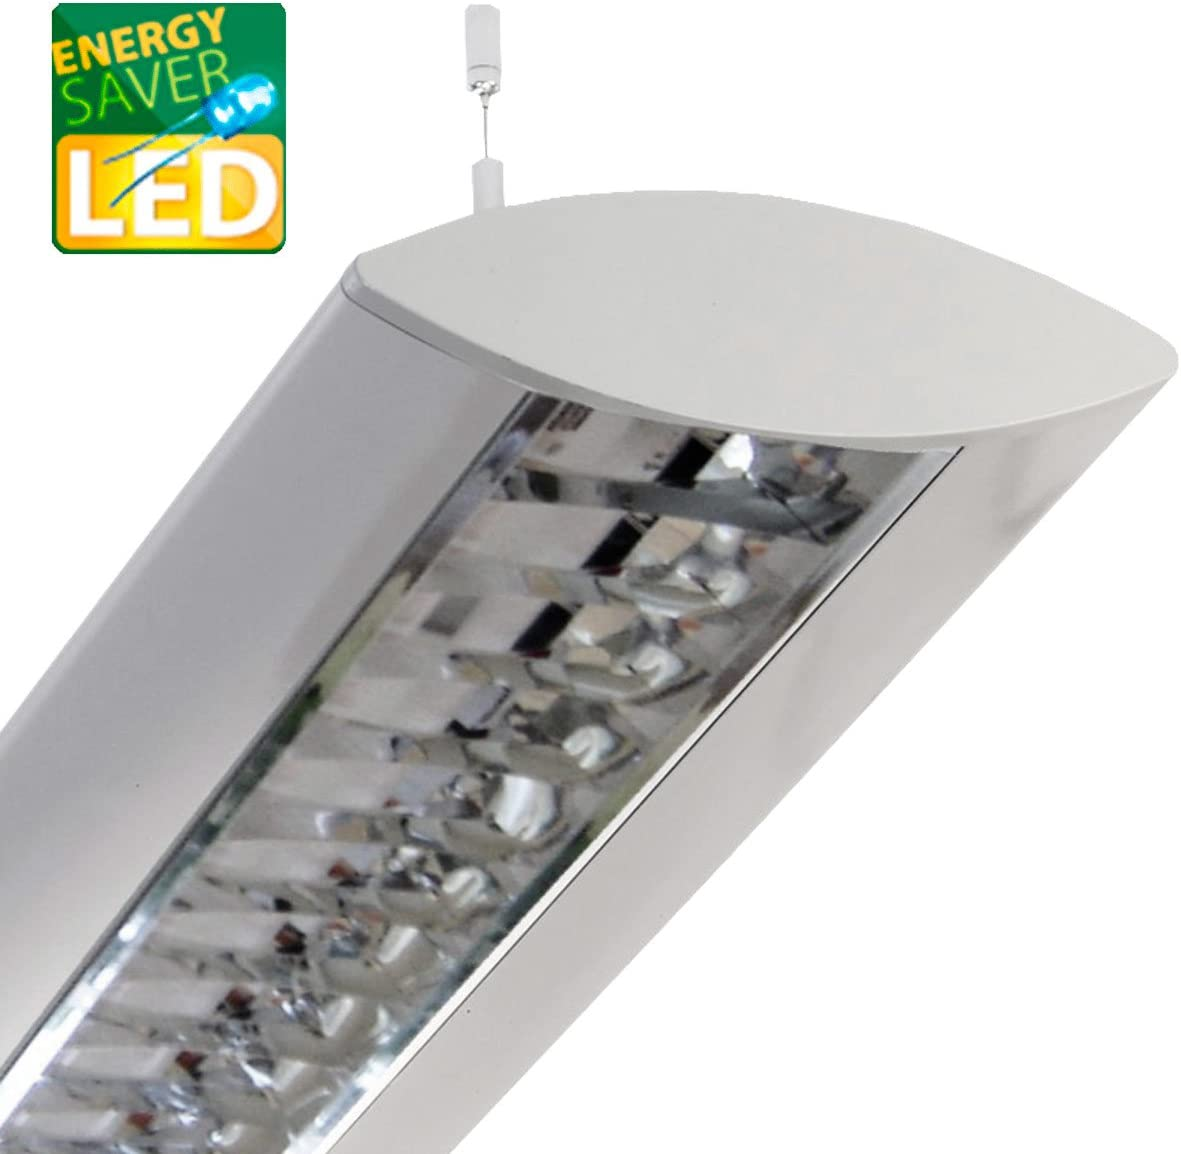 DESIGN Büro Pendelleuchte Silber Arbeitsplatzbeleuchtung Tageslicht Bürolampen